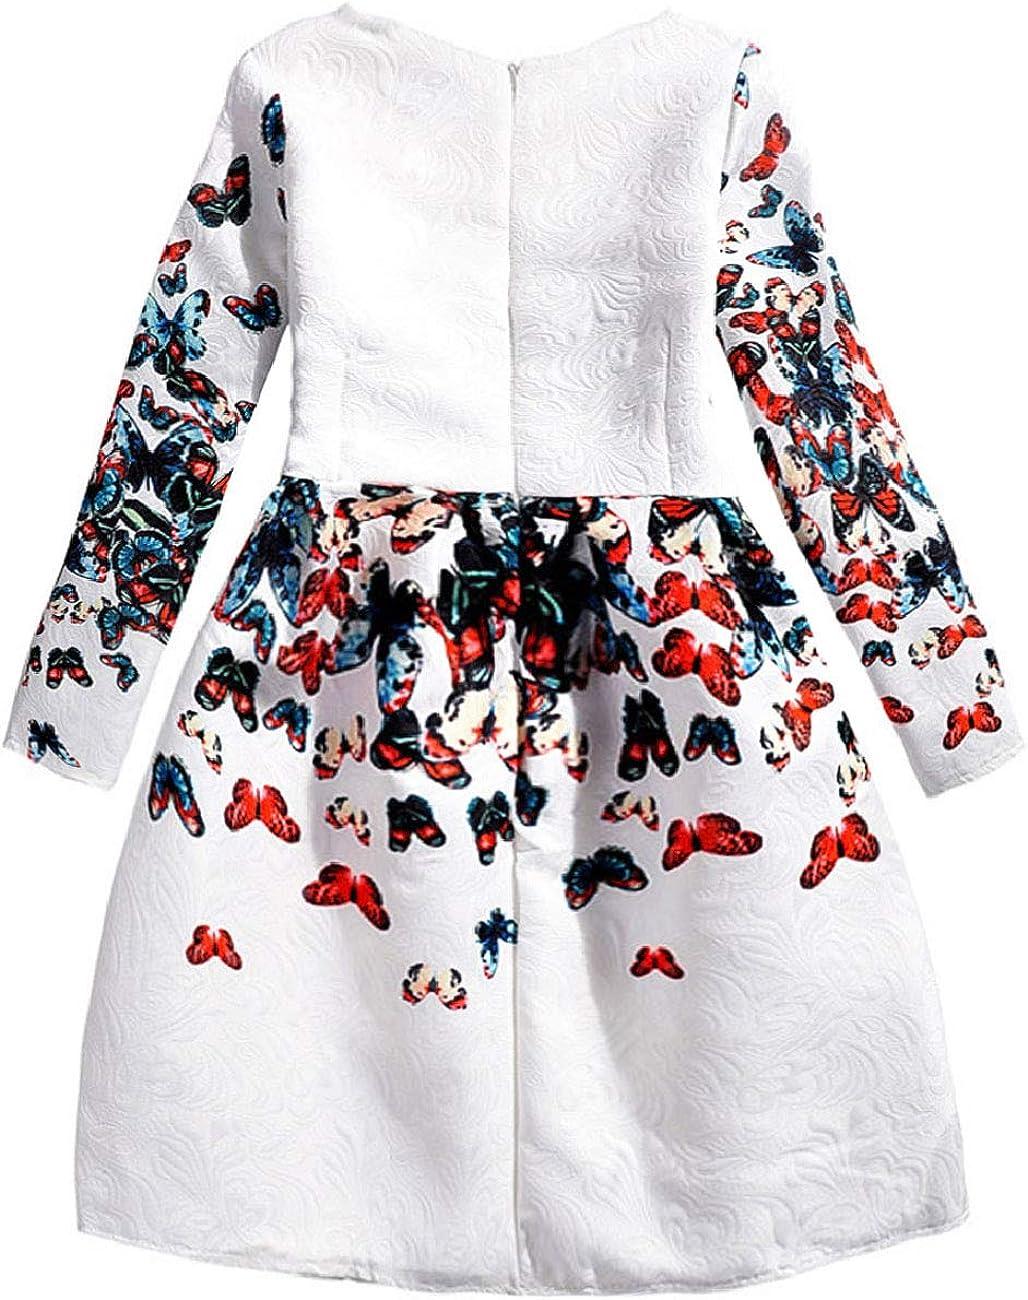 21KIDS Creative Art Colorful Print Summer Girls Casual Dress Size 6-12